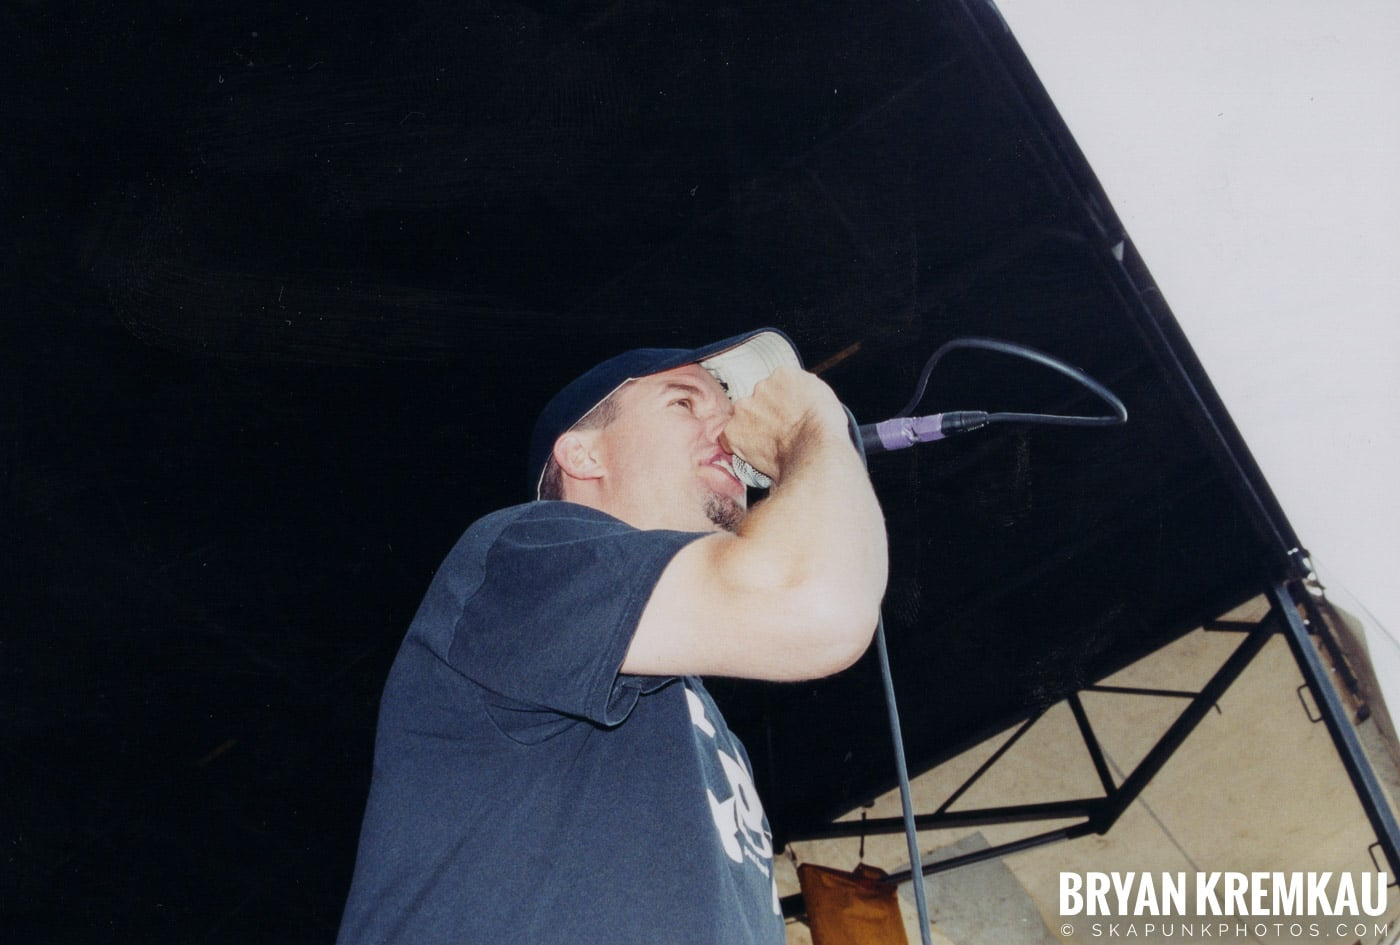 The Vandals @ Vans Warped Tour, Randall's Island, NYC - 8.7.04 (5)